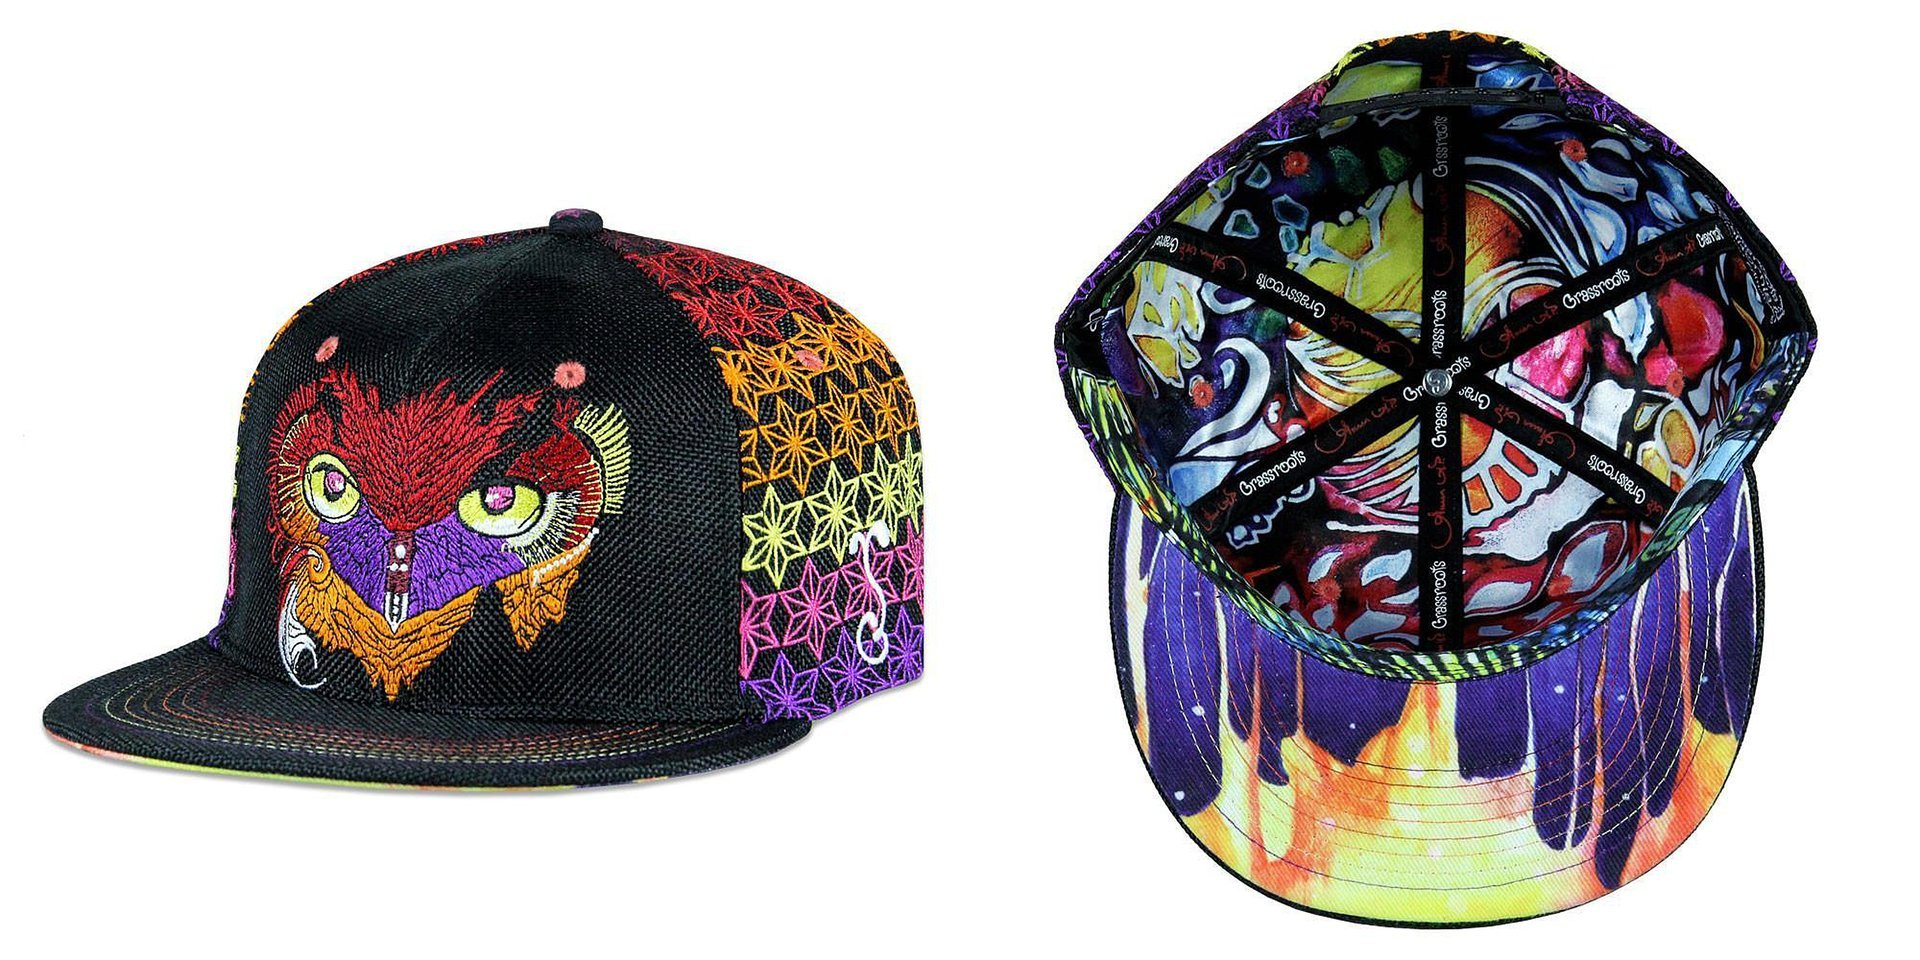 Gwen AP Warm Owl Snapback Grassroots California Hat